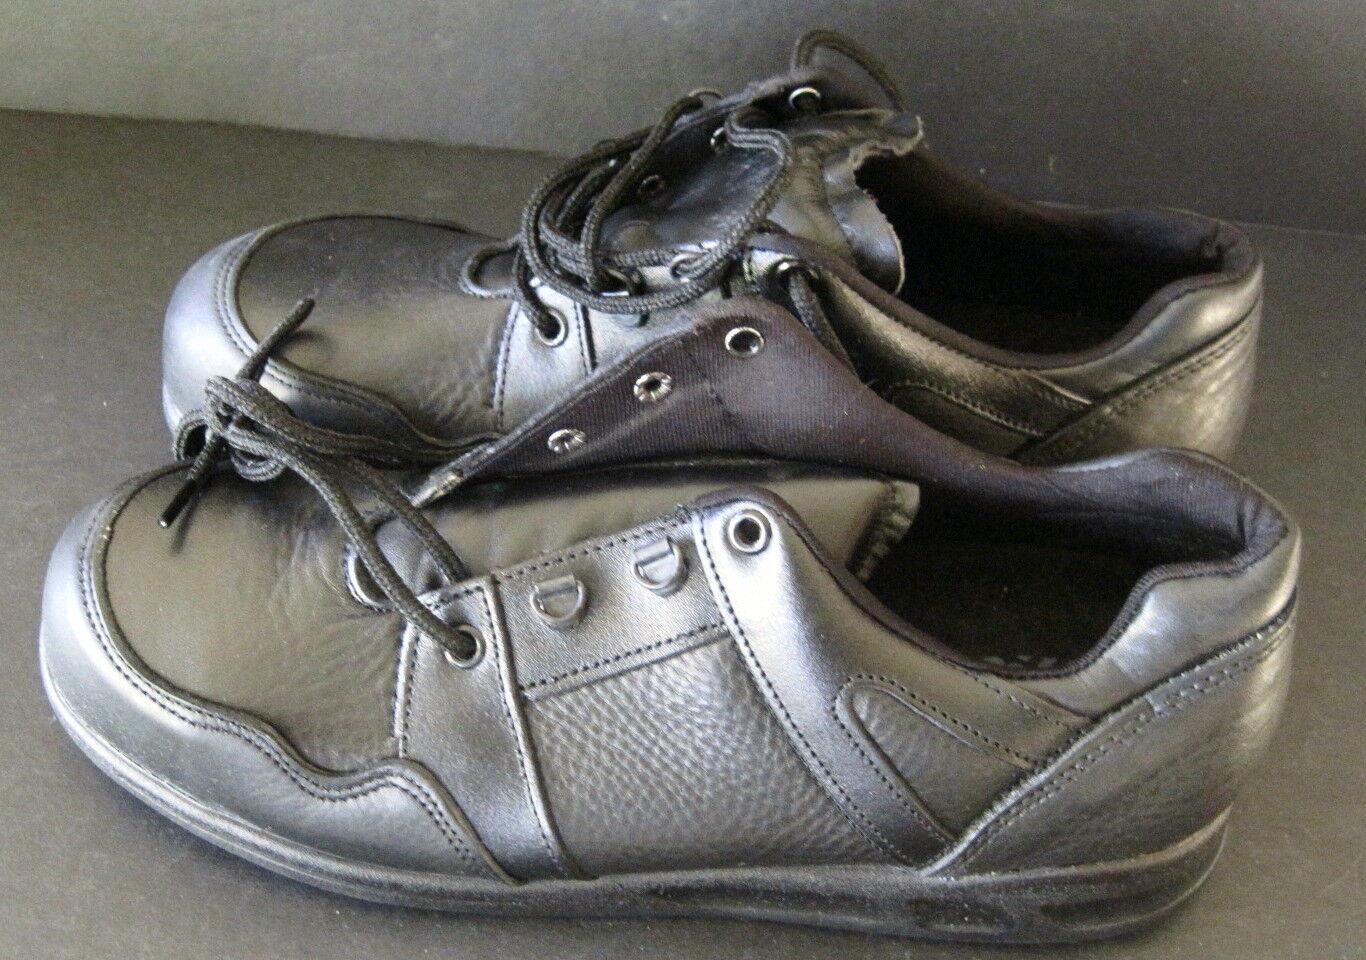 NIB Footbrakes Men's Safety Toe Footwear Sz 10 M Black Leather Shoes Boots